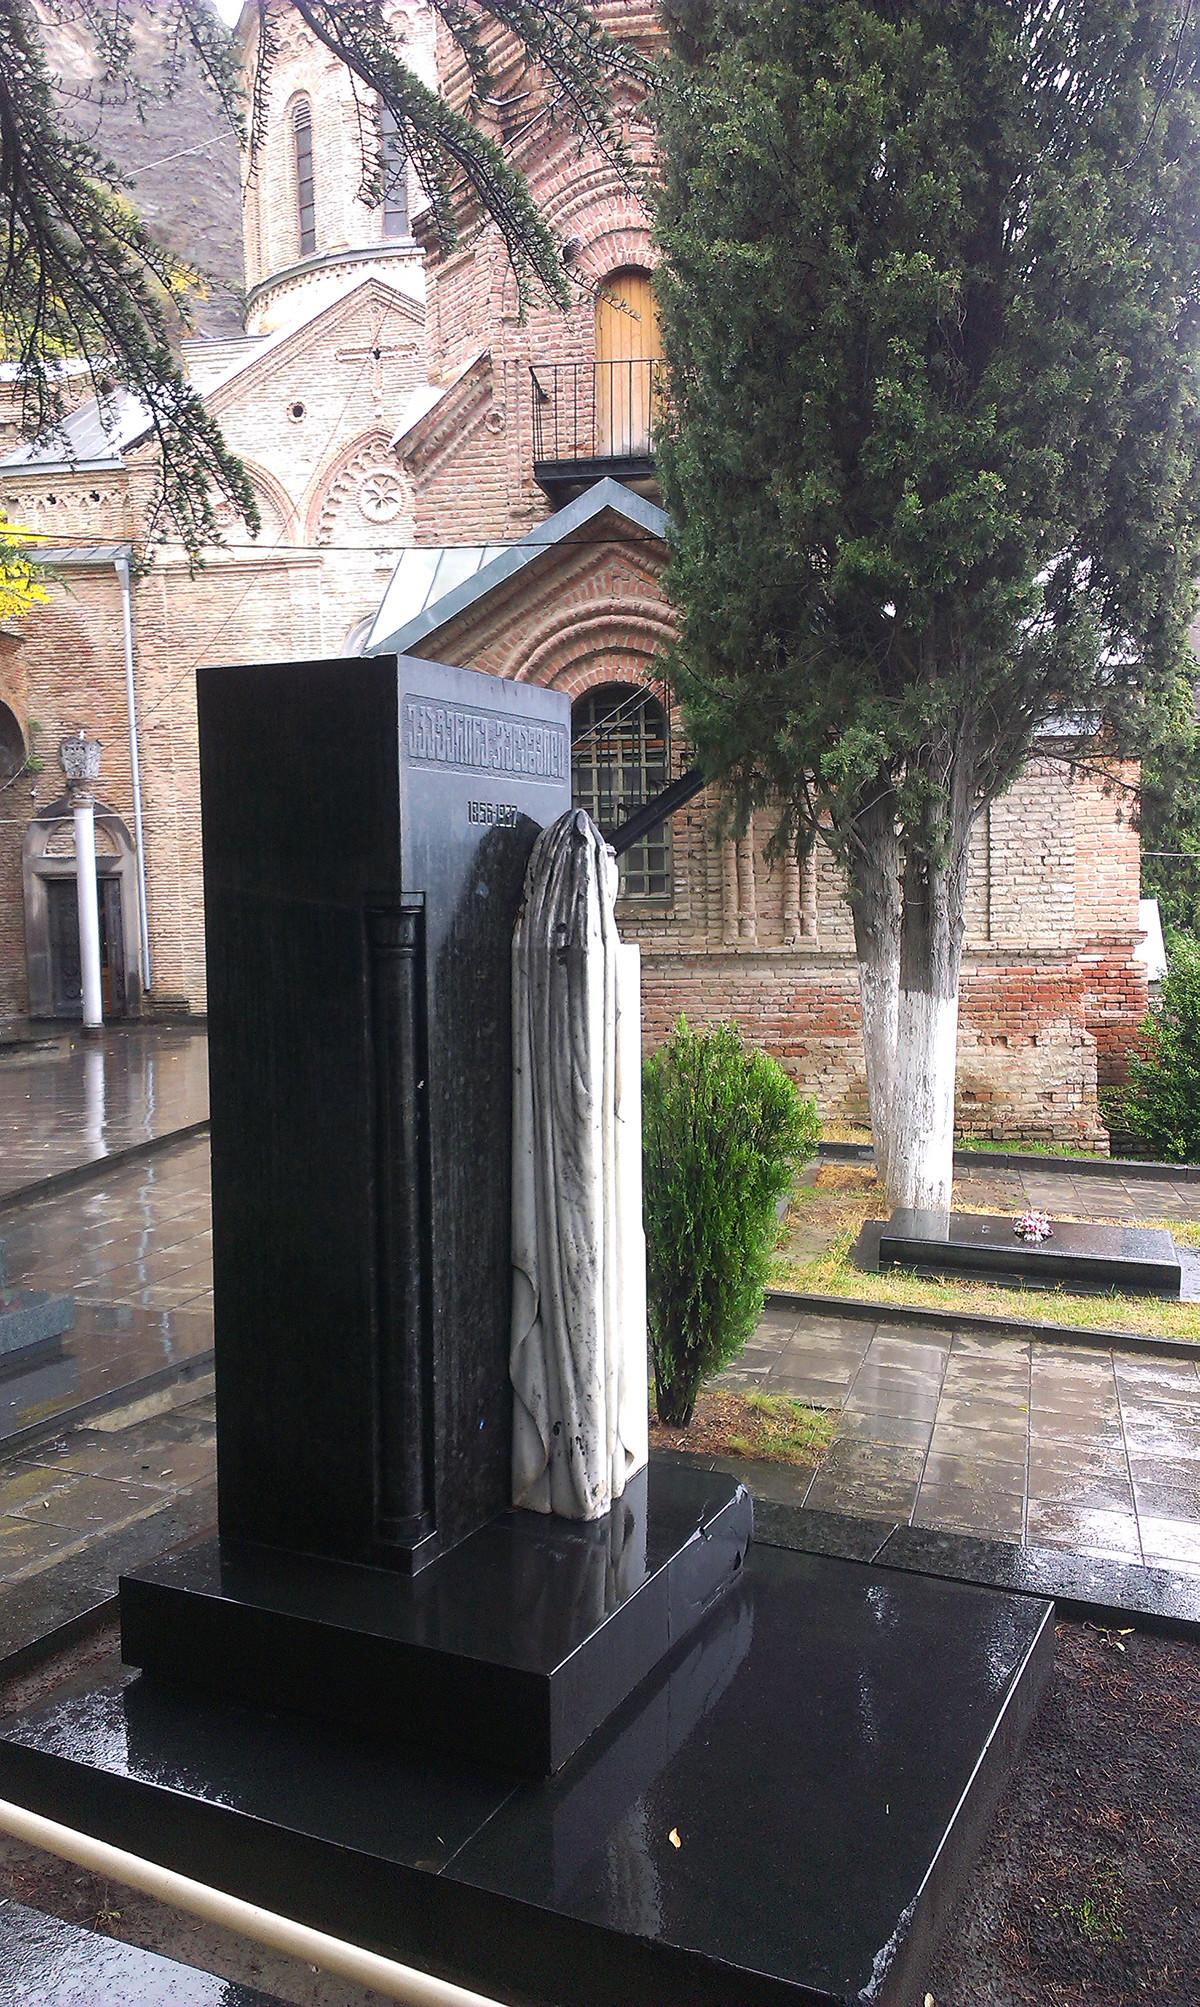 Grob Keke Geladze na območju panteona Mtatsminda v Tbilisiju